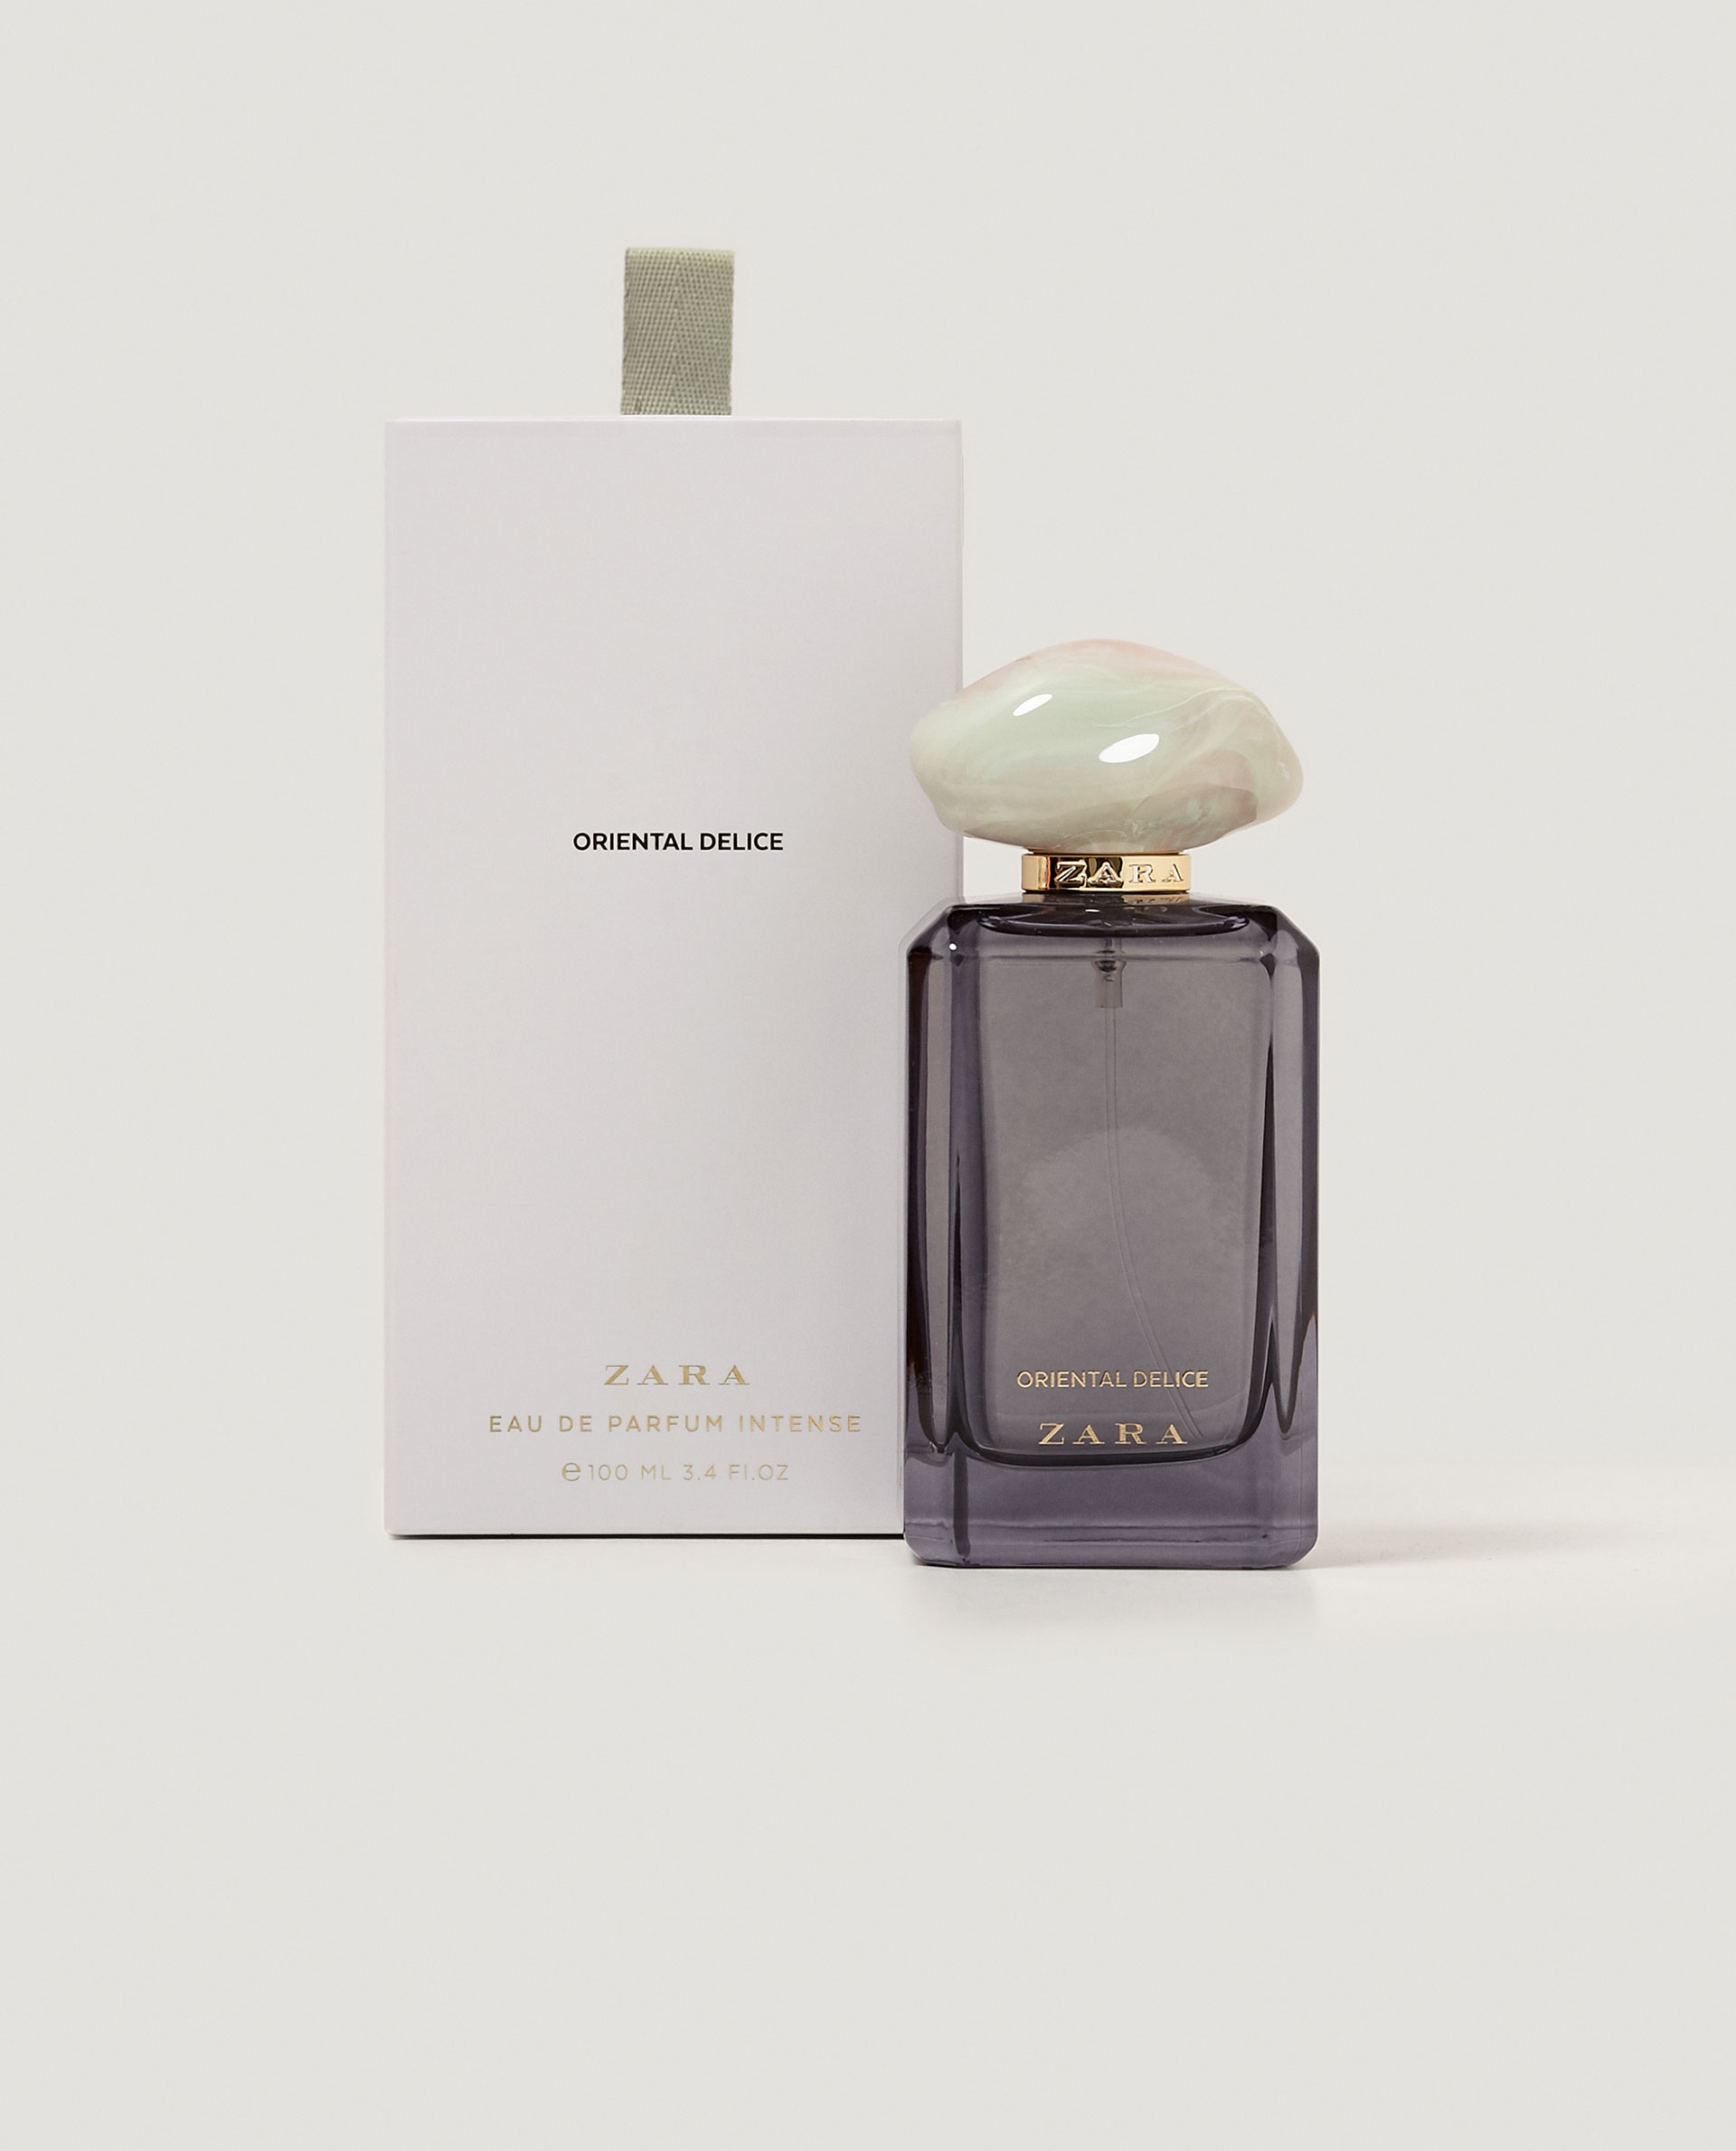 Oriental Delice Zara аромат новый аромат для женщин 2017